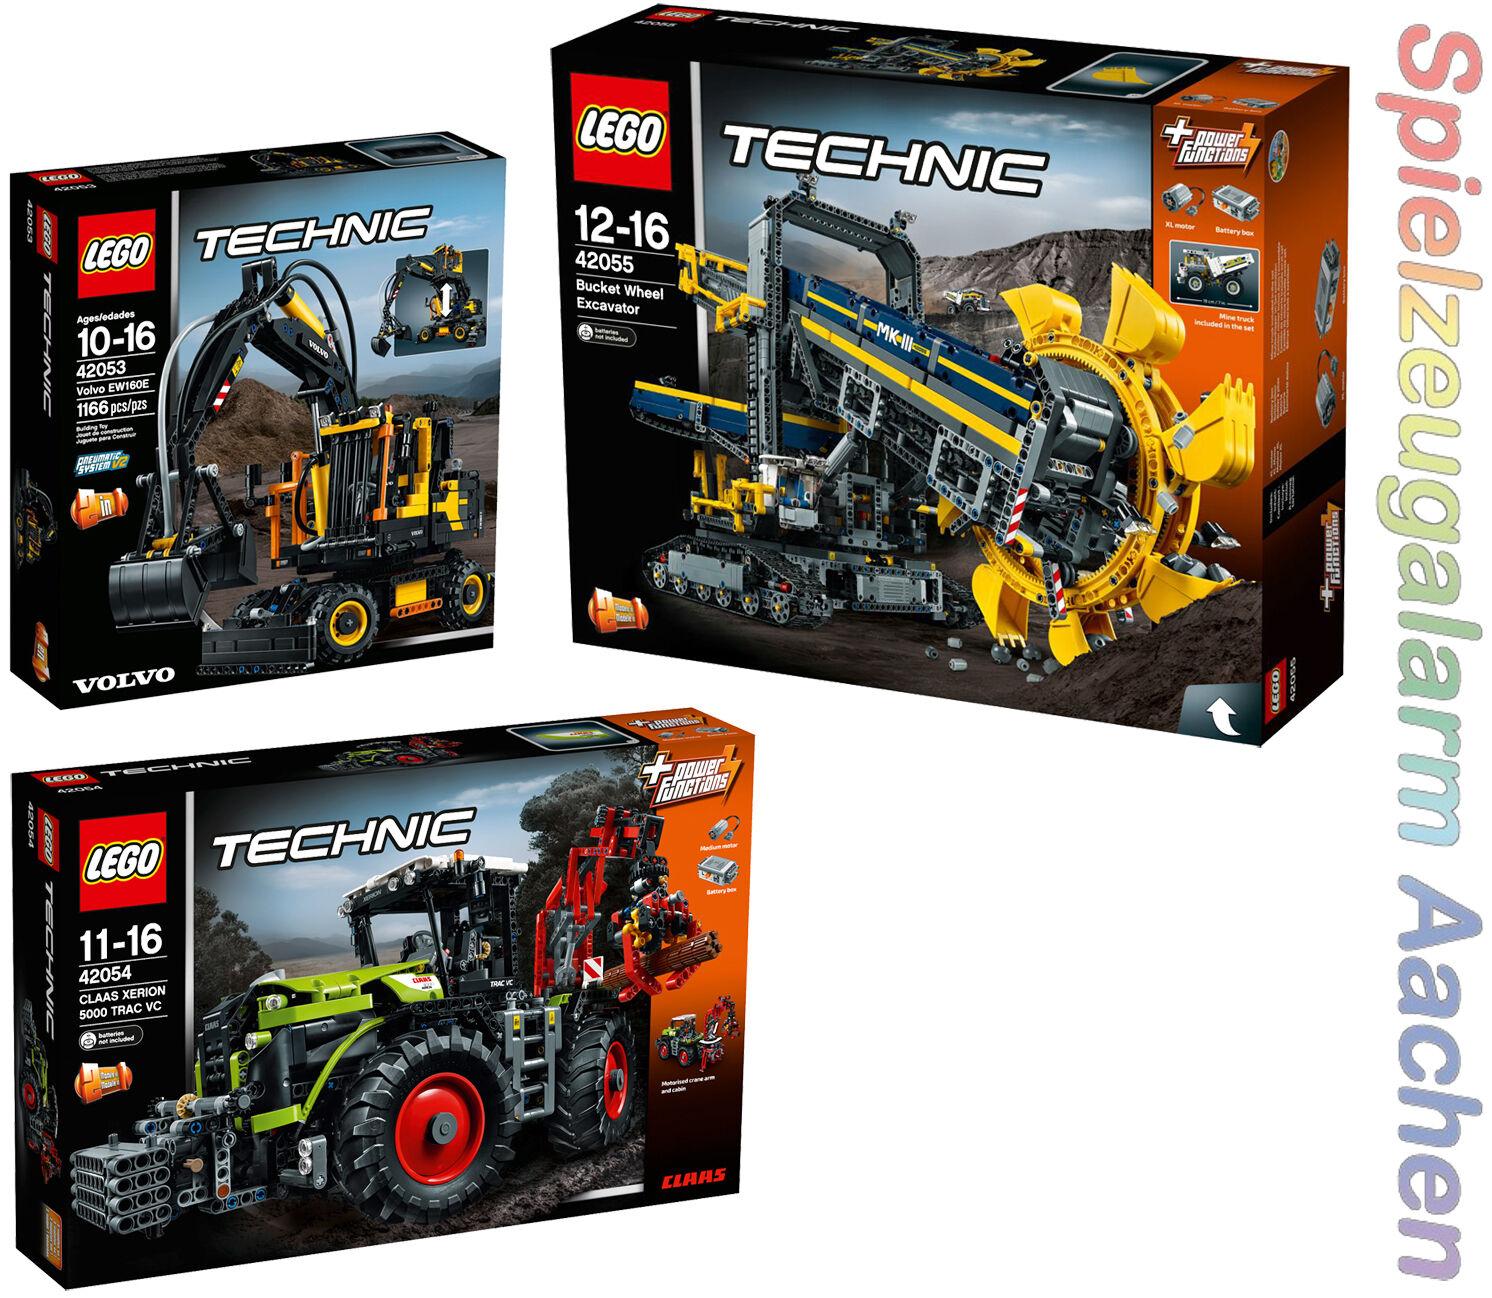 LEGO Technic 42053 42054 42055 ruota pale Escavatore aggiravano GRATIS DURACELL n16/8